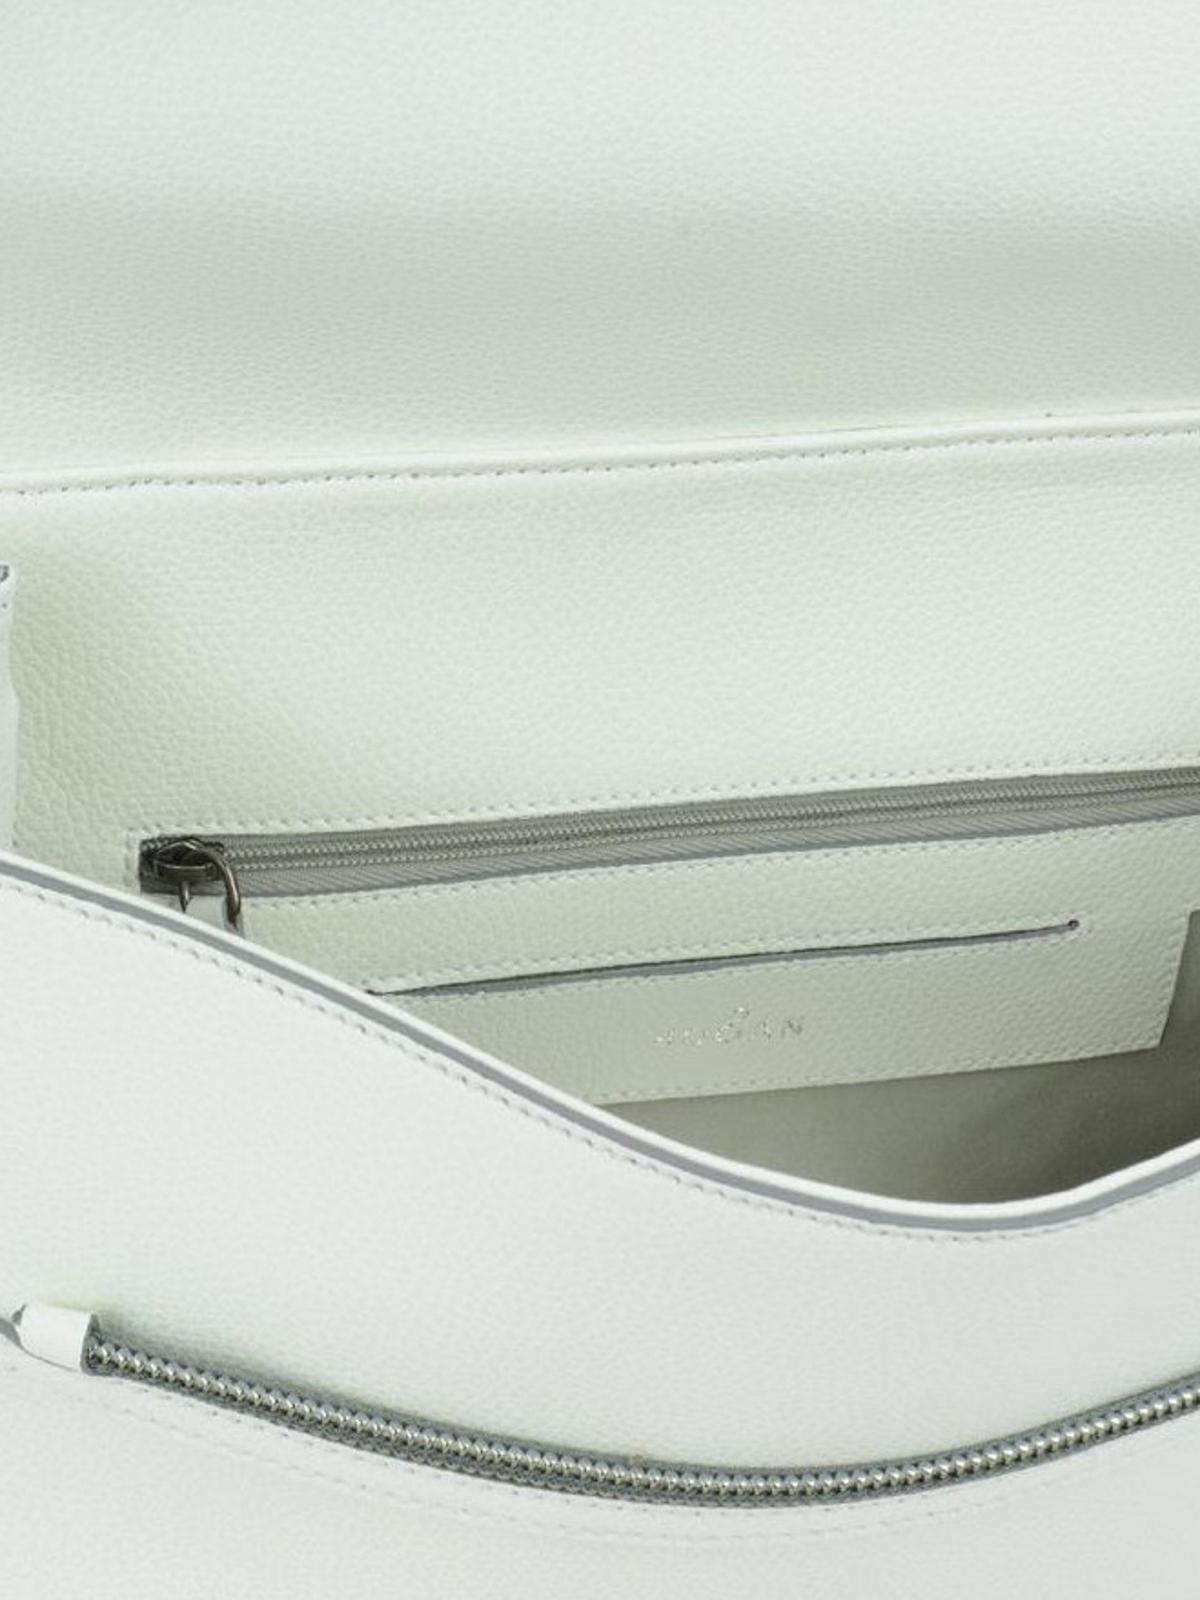 Hogan Clubbing grainy leather white bag s8WTL8iv